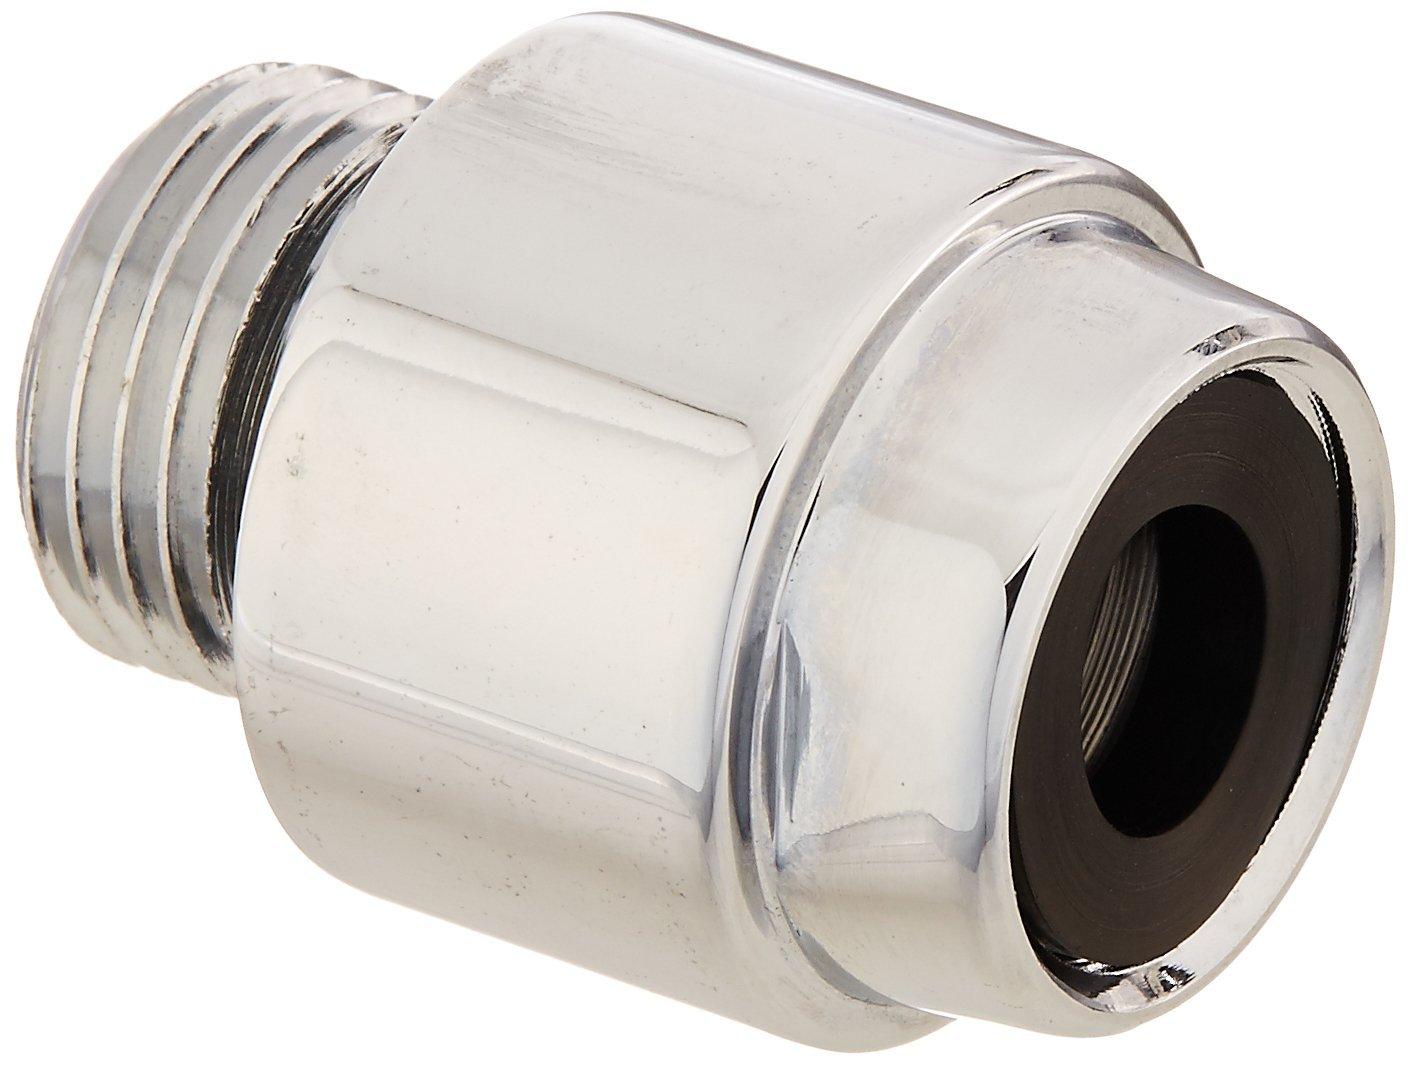 Park Supply of America VB4900 Hand Held Shower Vacuum Breaker by Park Supply of America